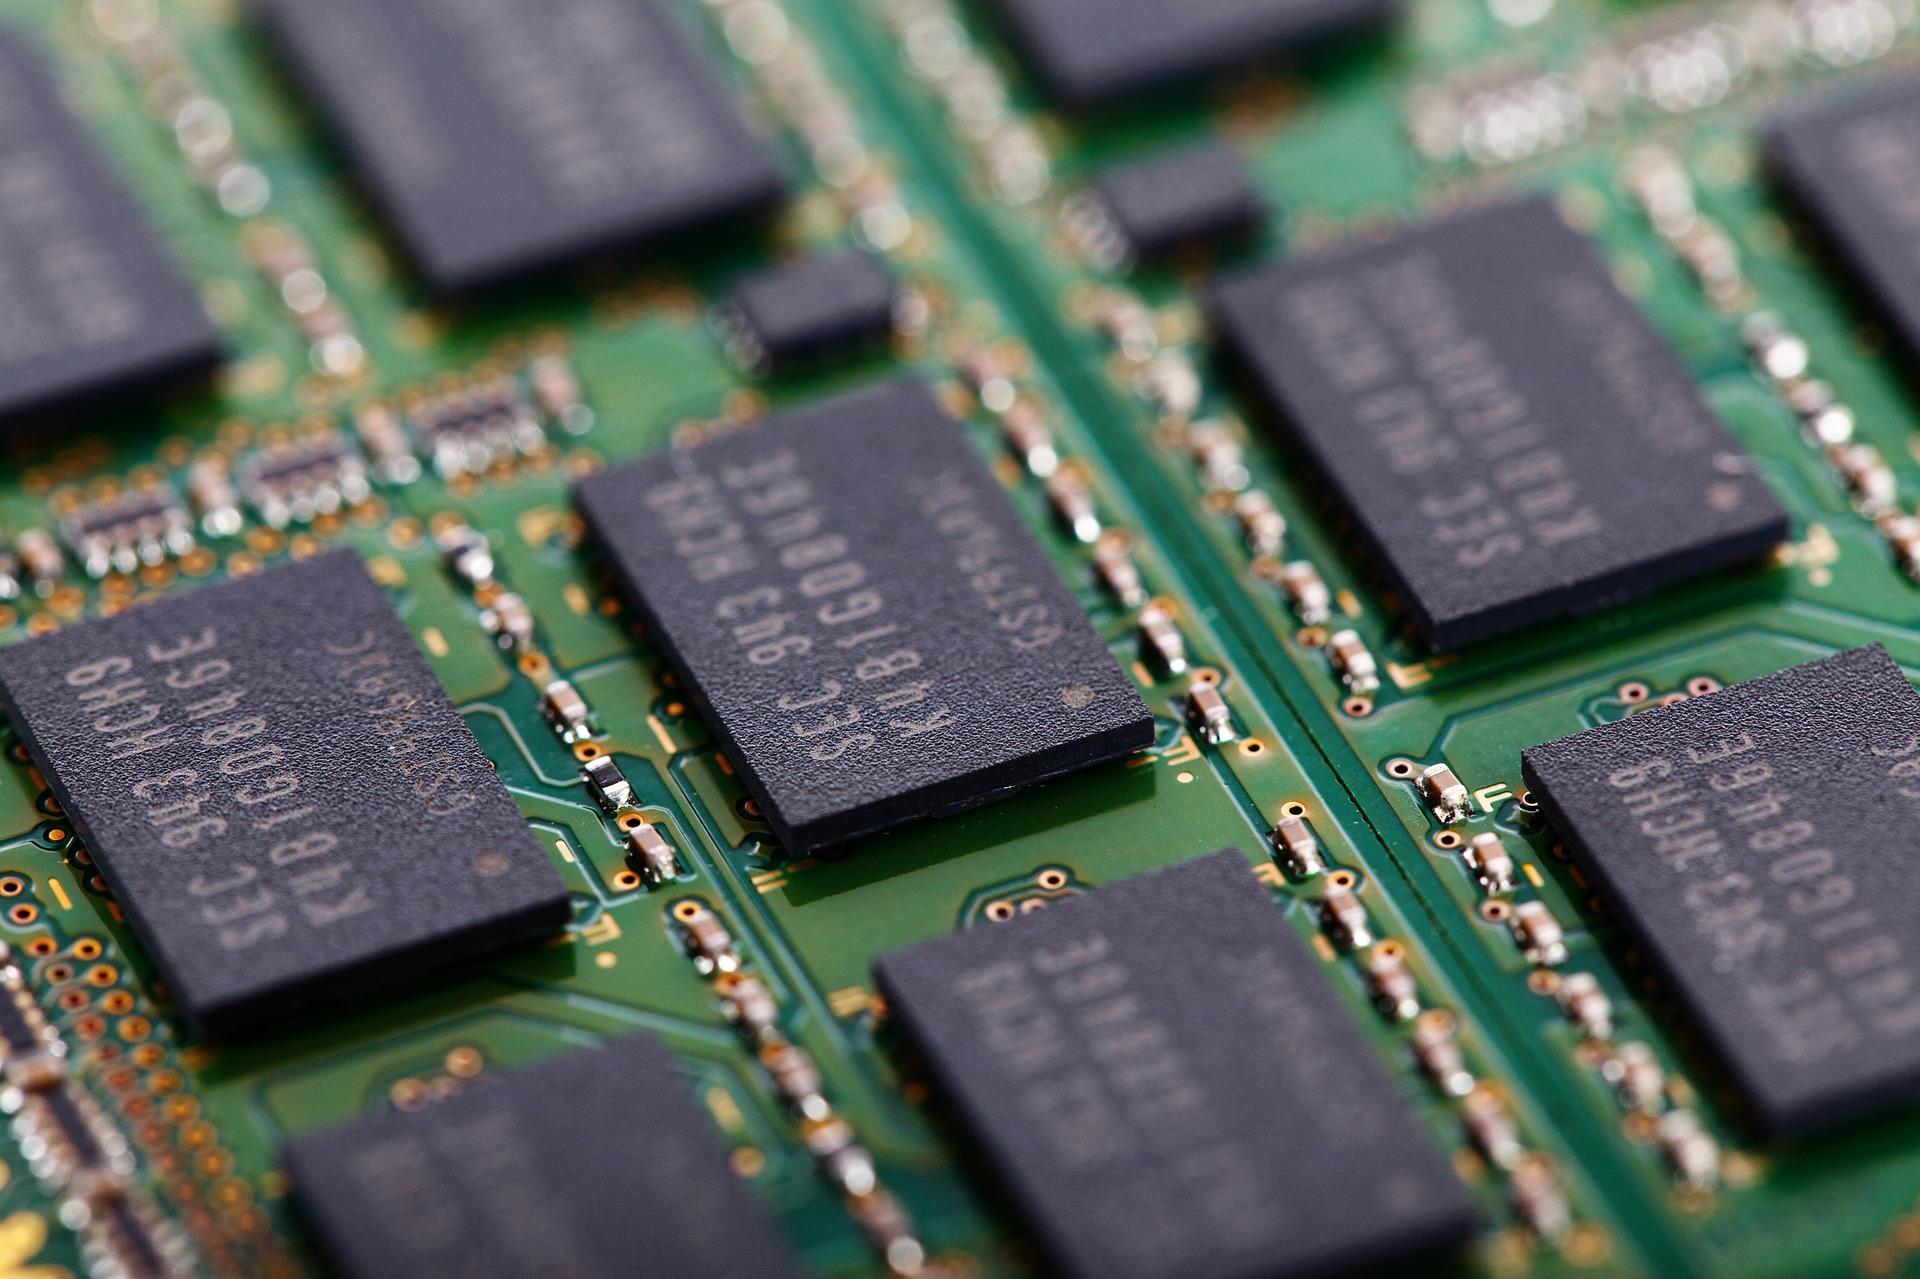 оперативная память NAND и DRAM